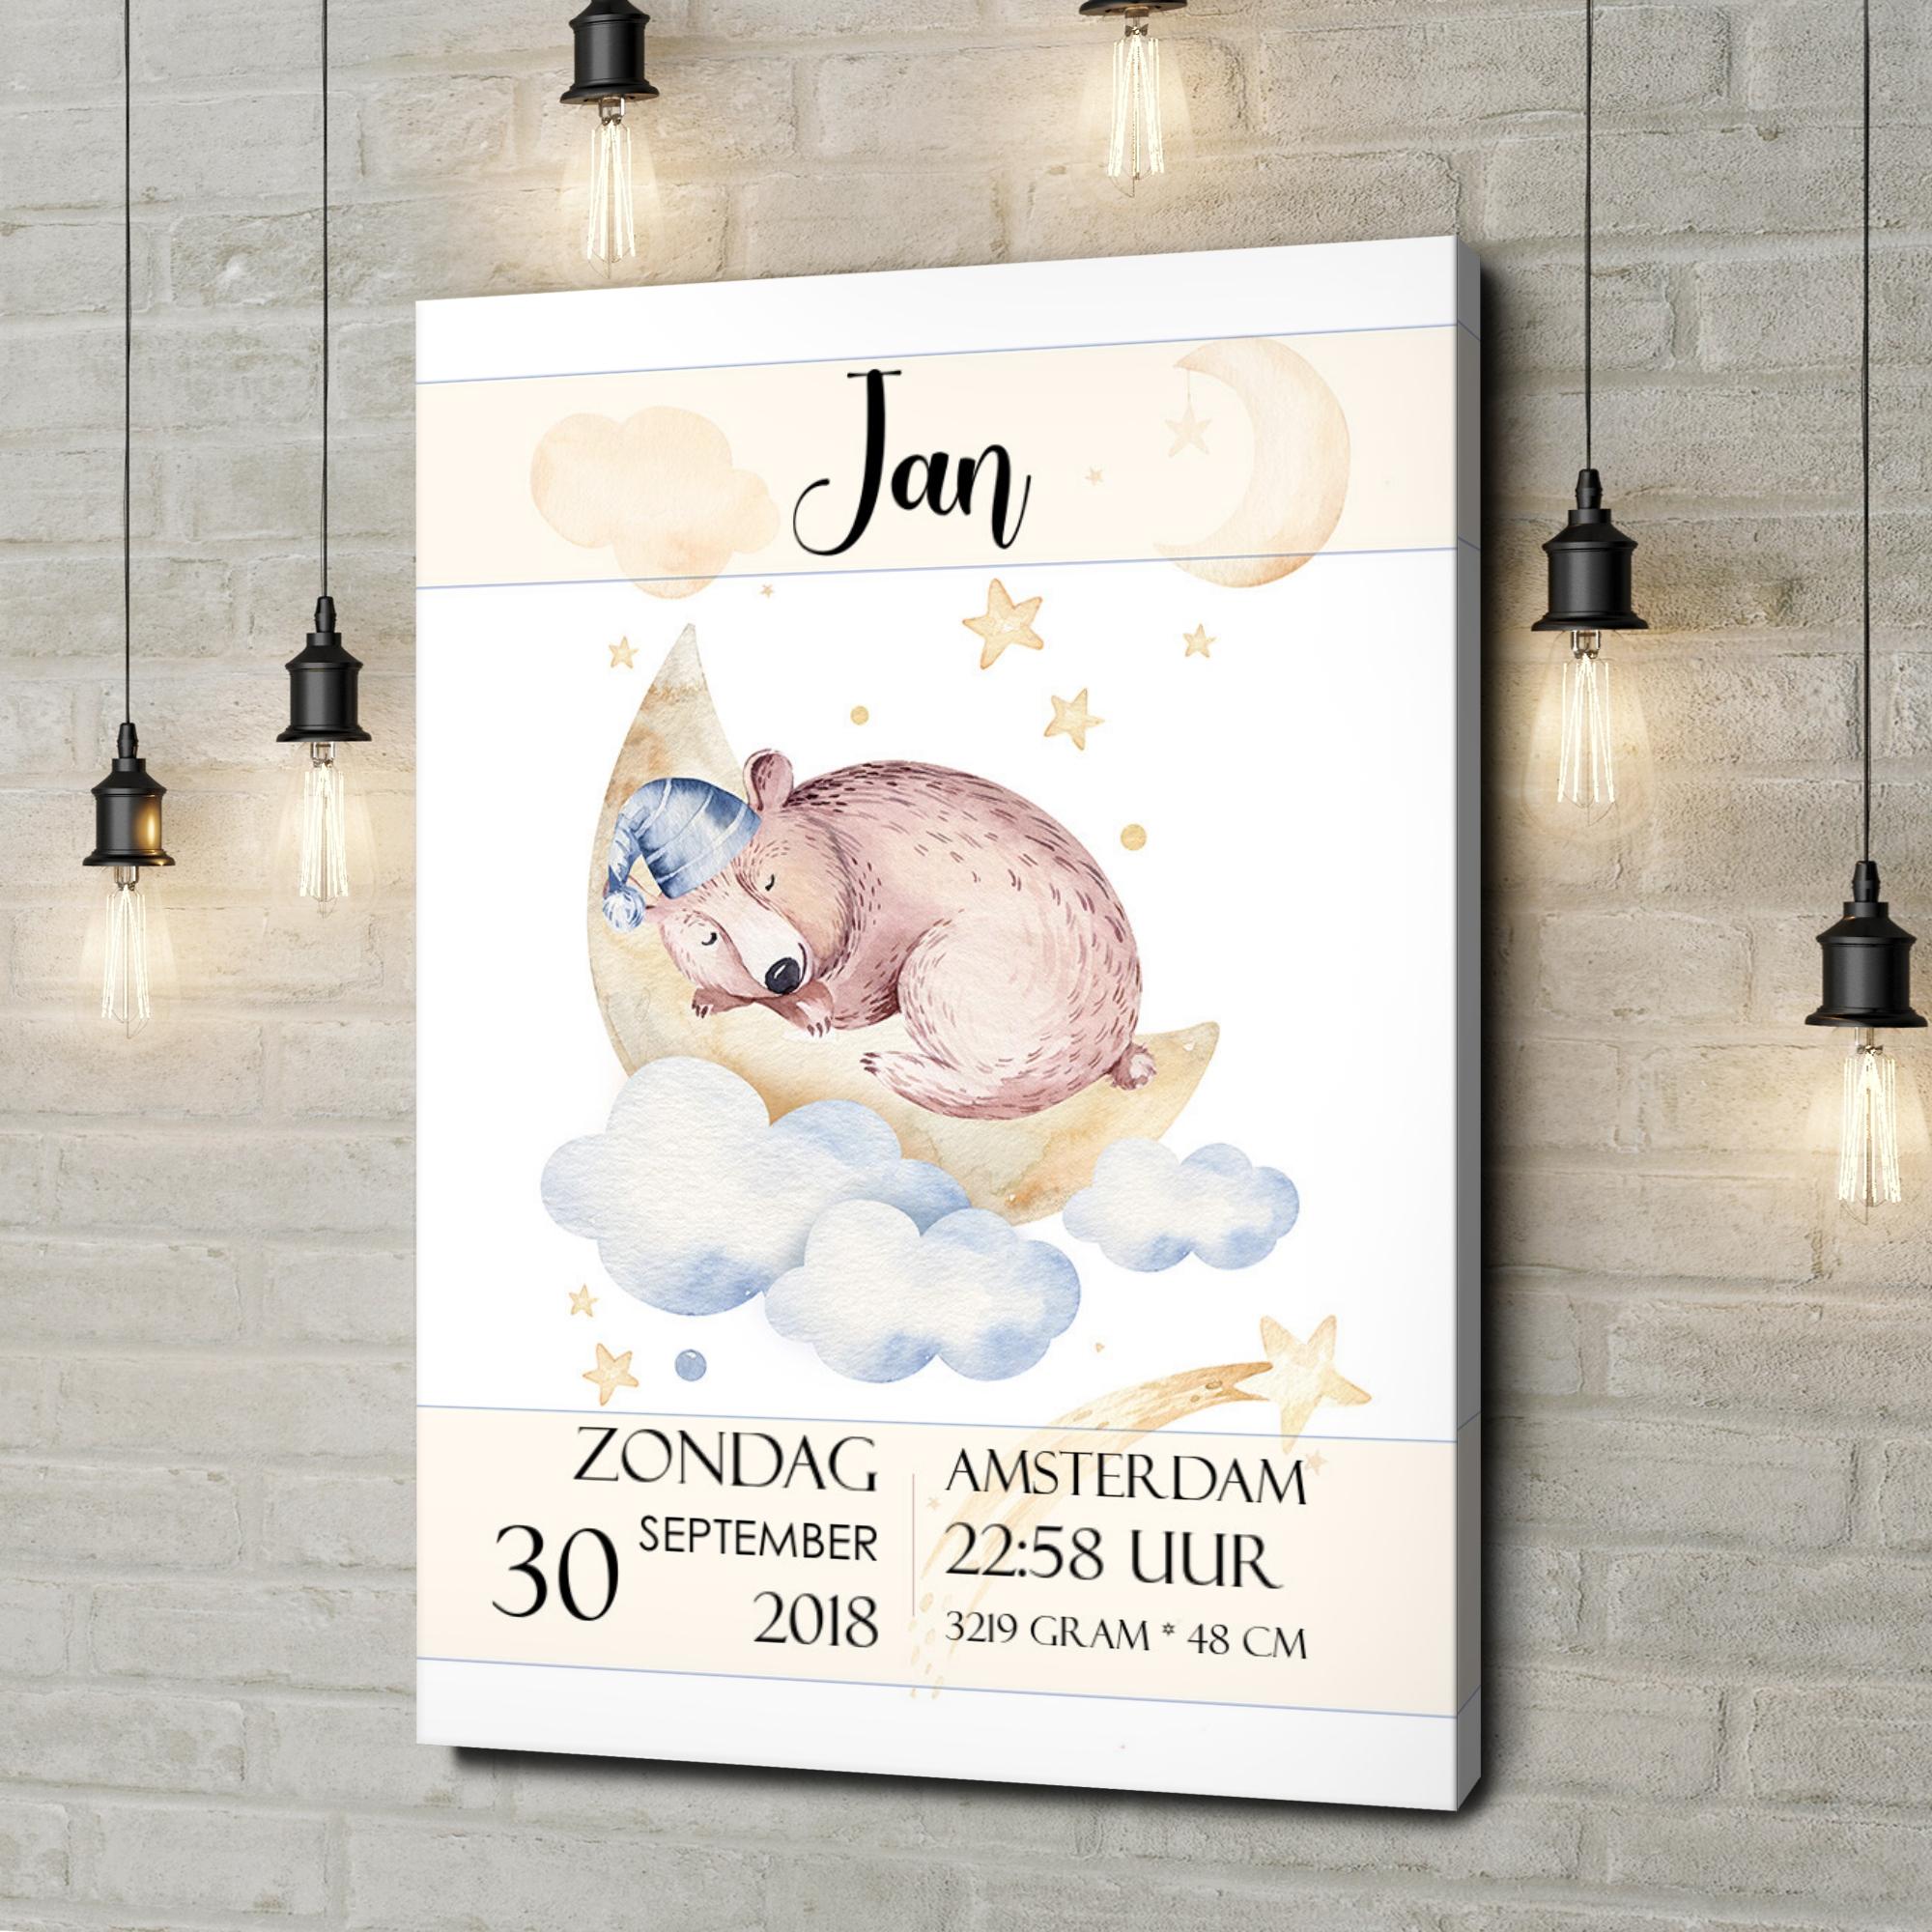 Gepersonaliseerde canvas print Canvas voor geboorte beer droomt